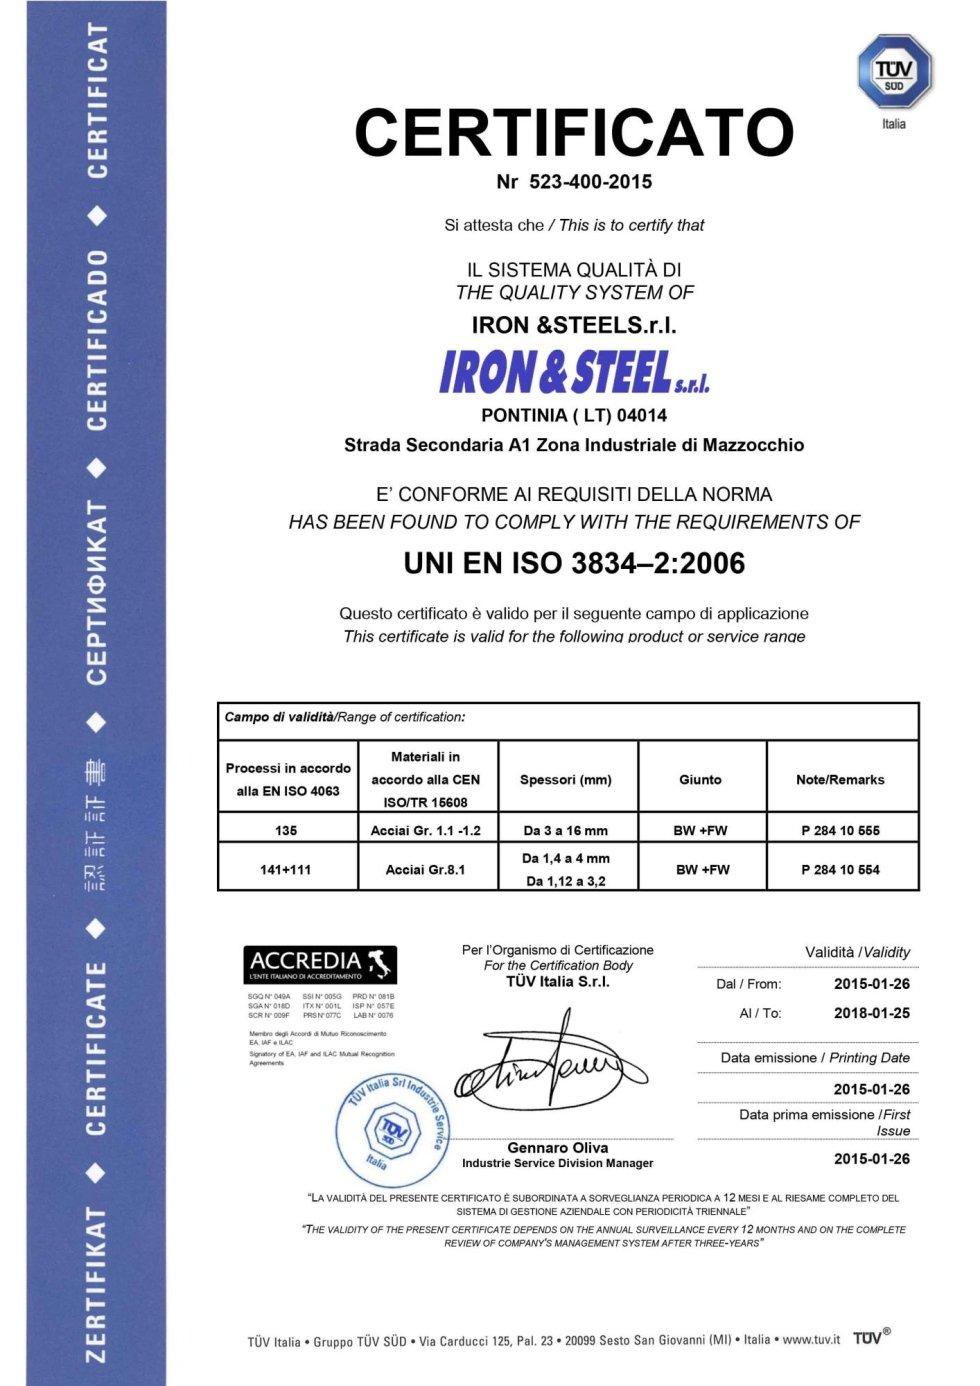 Certificato TUV ISO 3834